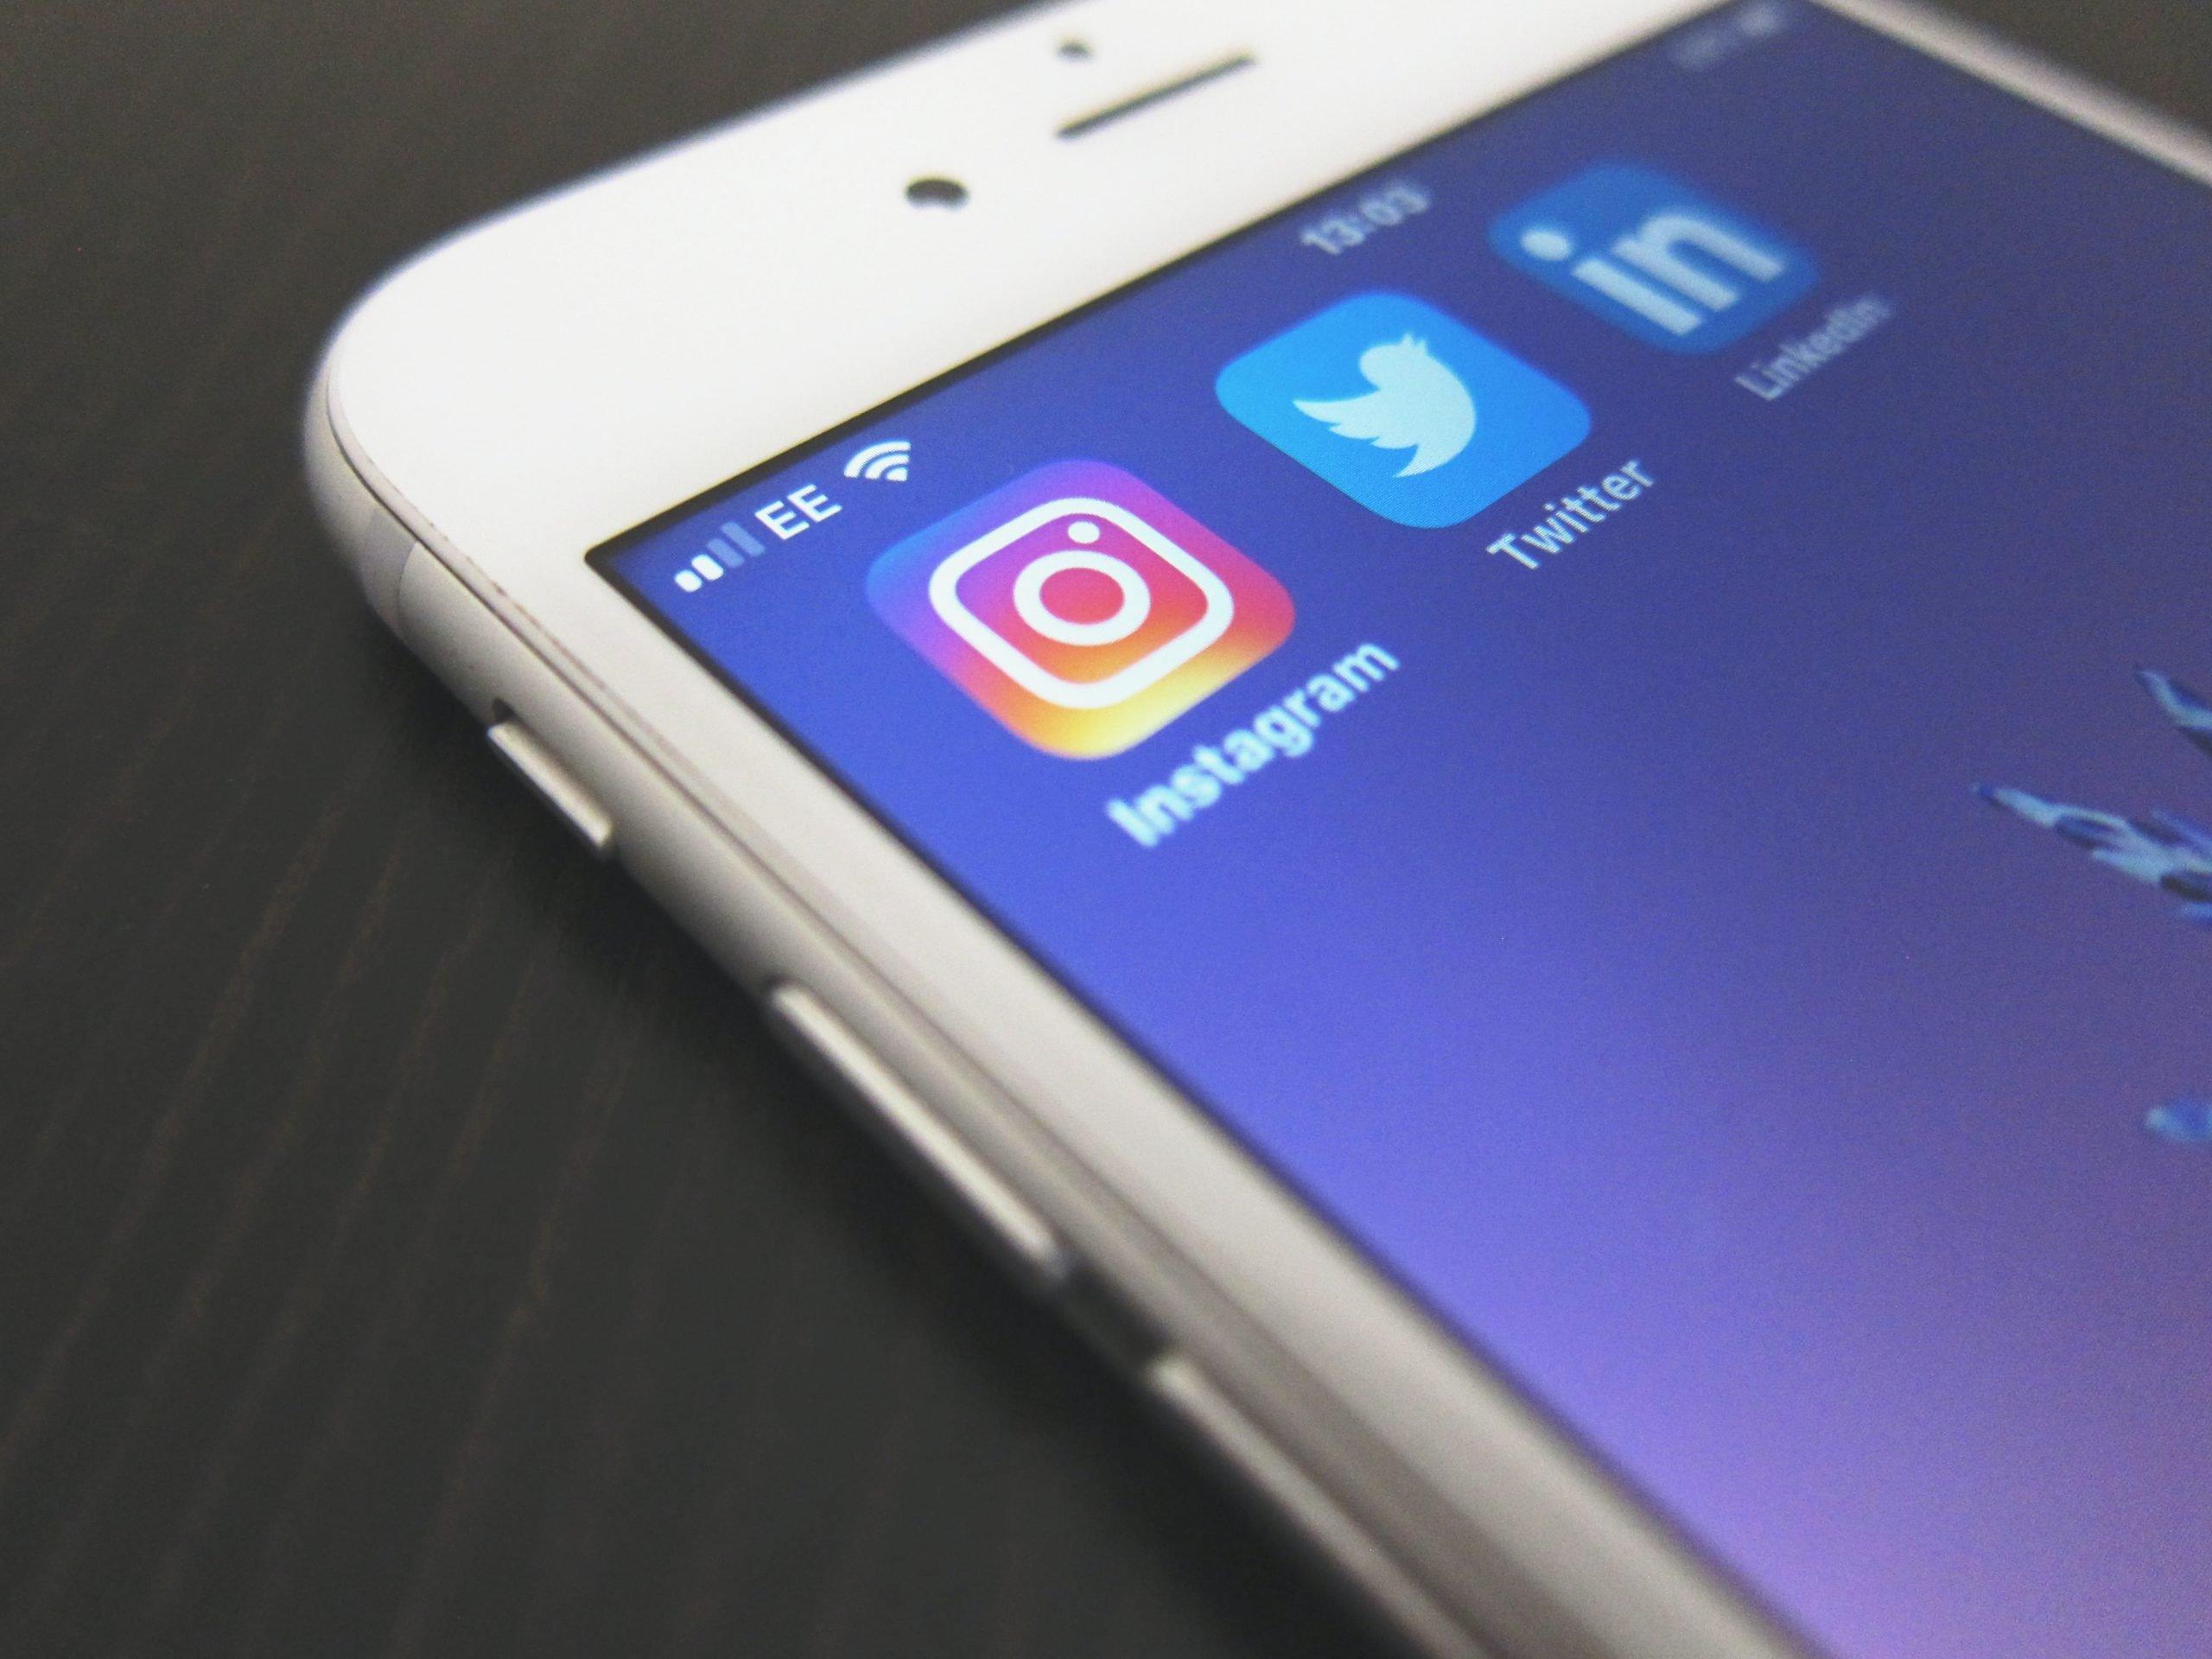 Guida rapida sull'algoritmo di Instagram